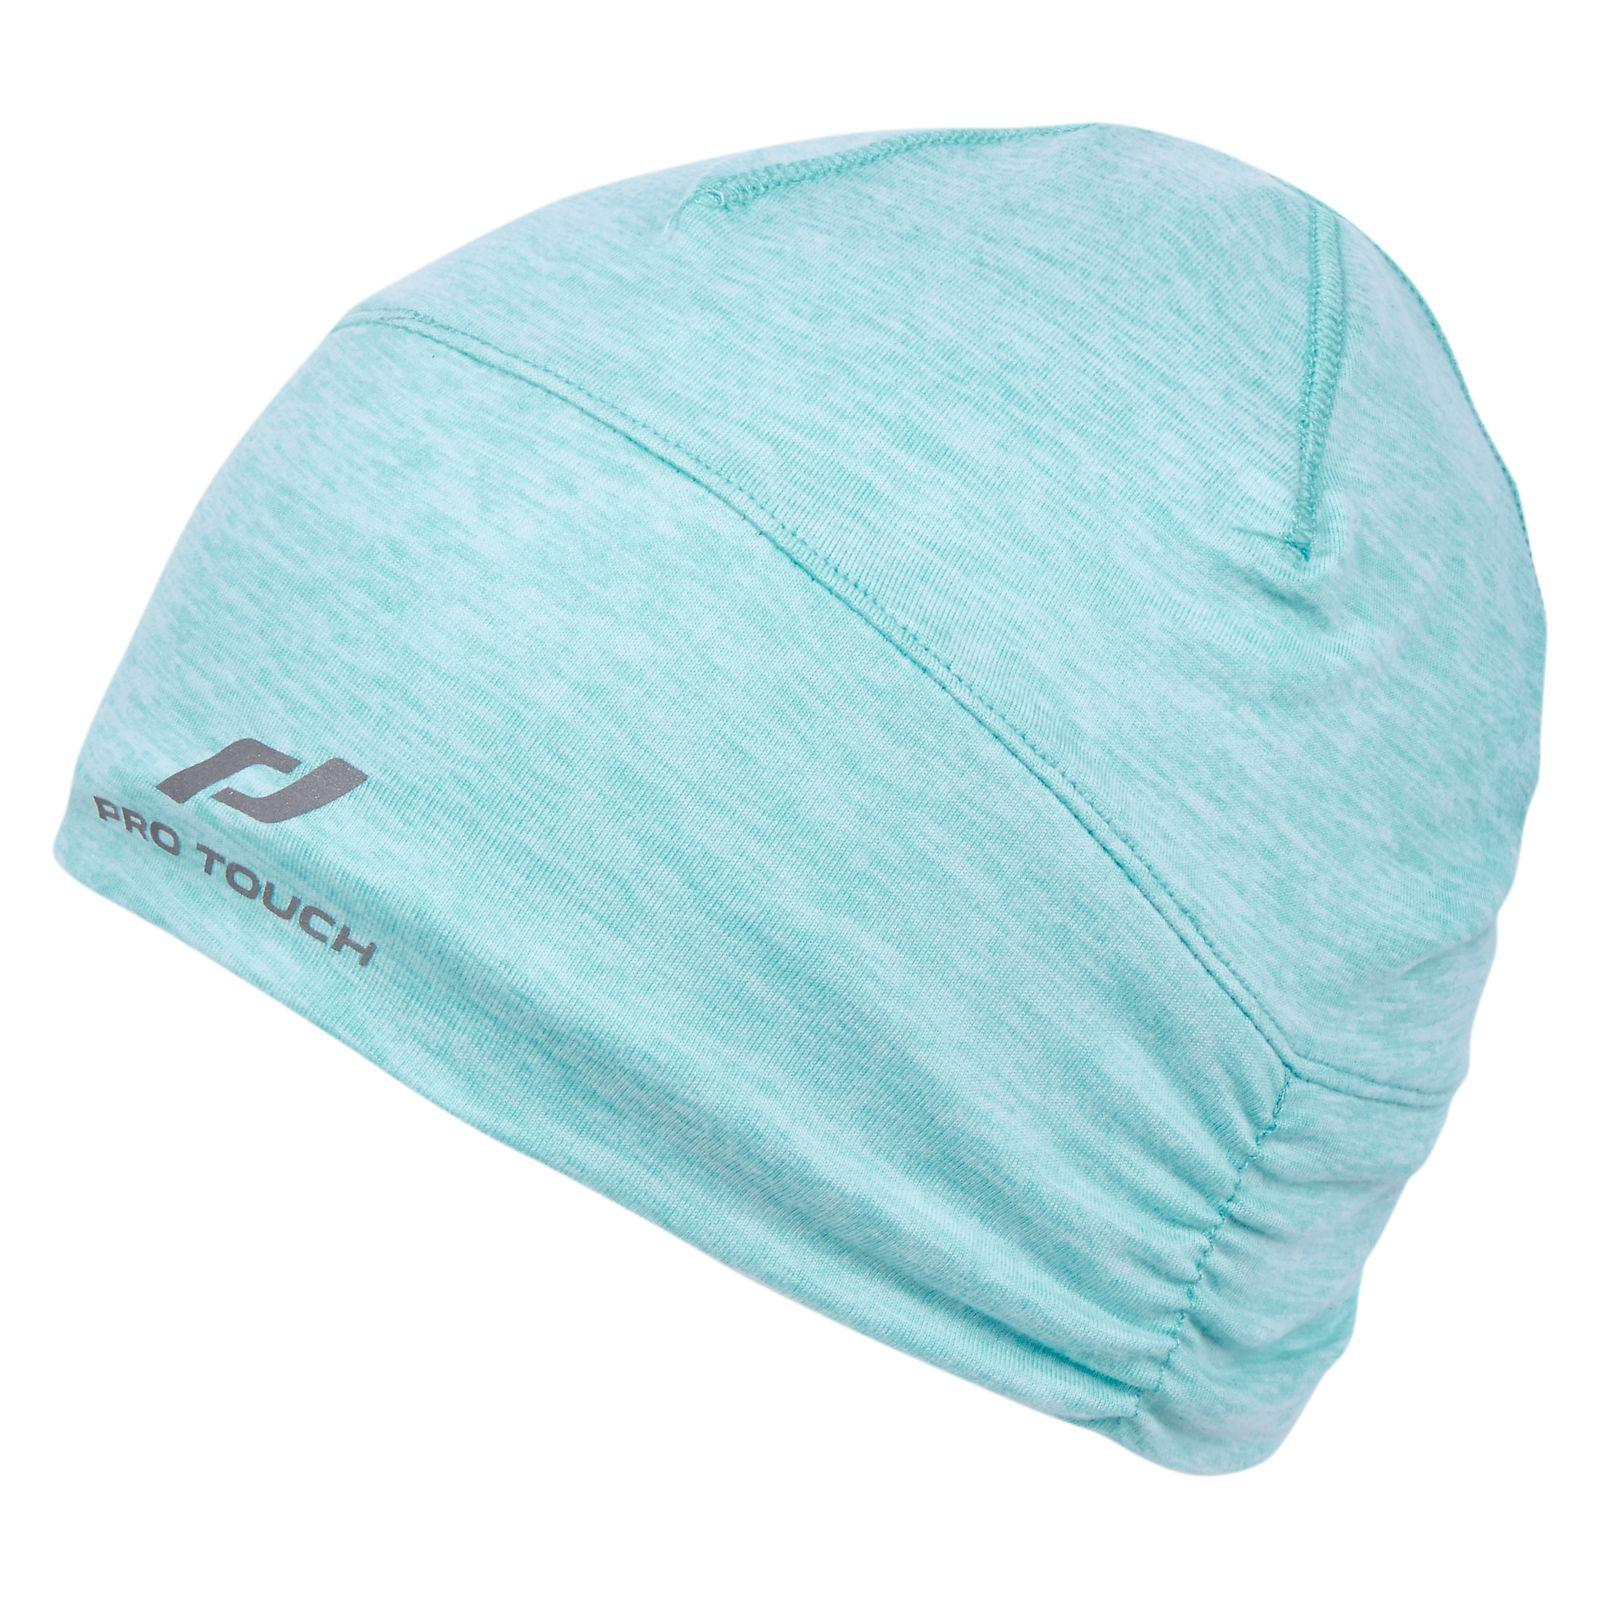 Женская беговая шапка PRO TOUCH Brooke warm